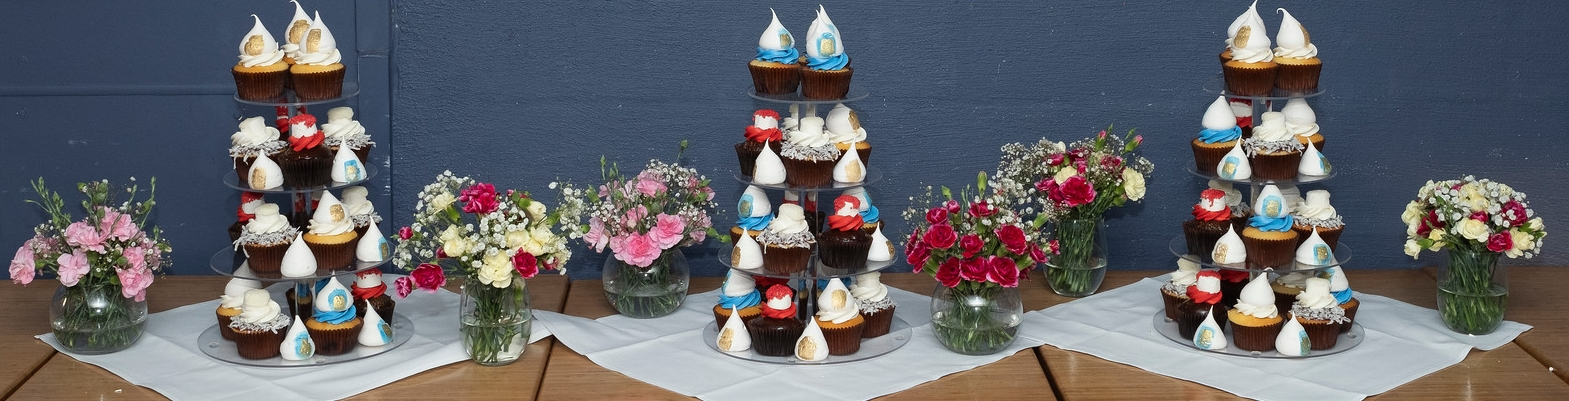 Wedding Cup Cakes .jpg